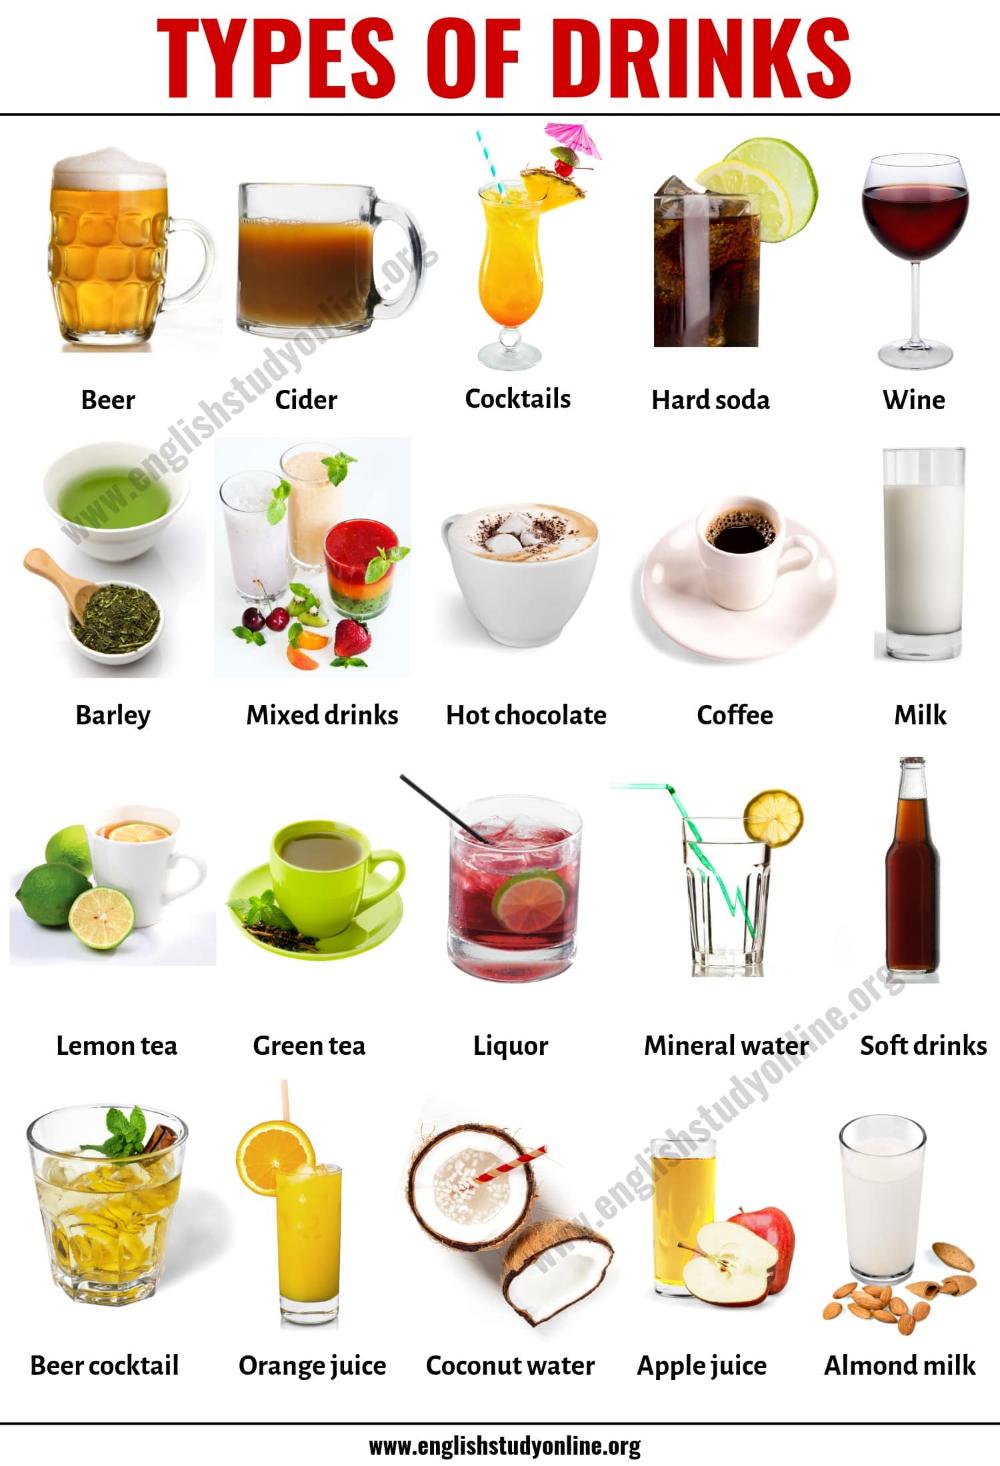 drinks names types drink list english popular vocabulary juice cocktails milk cider study coffee apple british chocolate englishstudyonline cranberry sushi